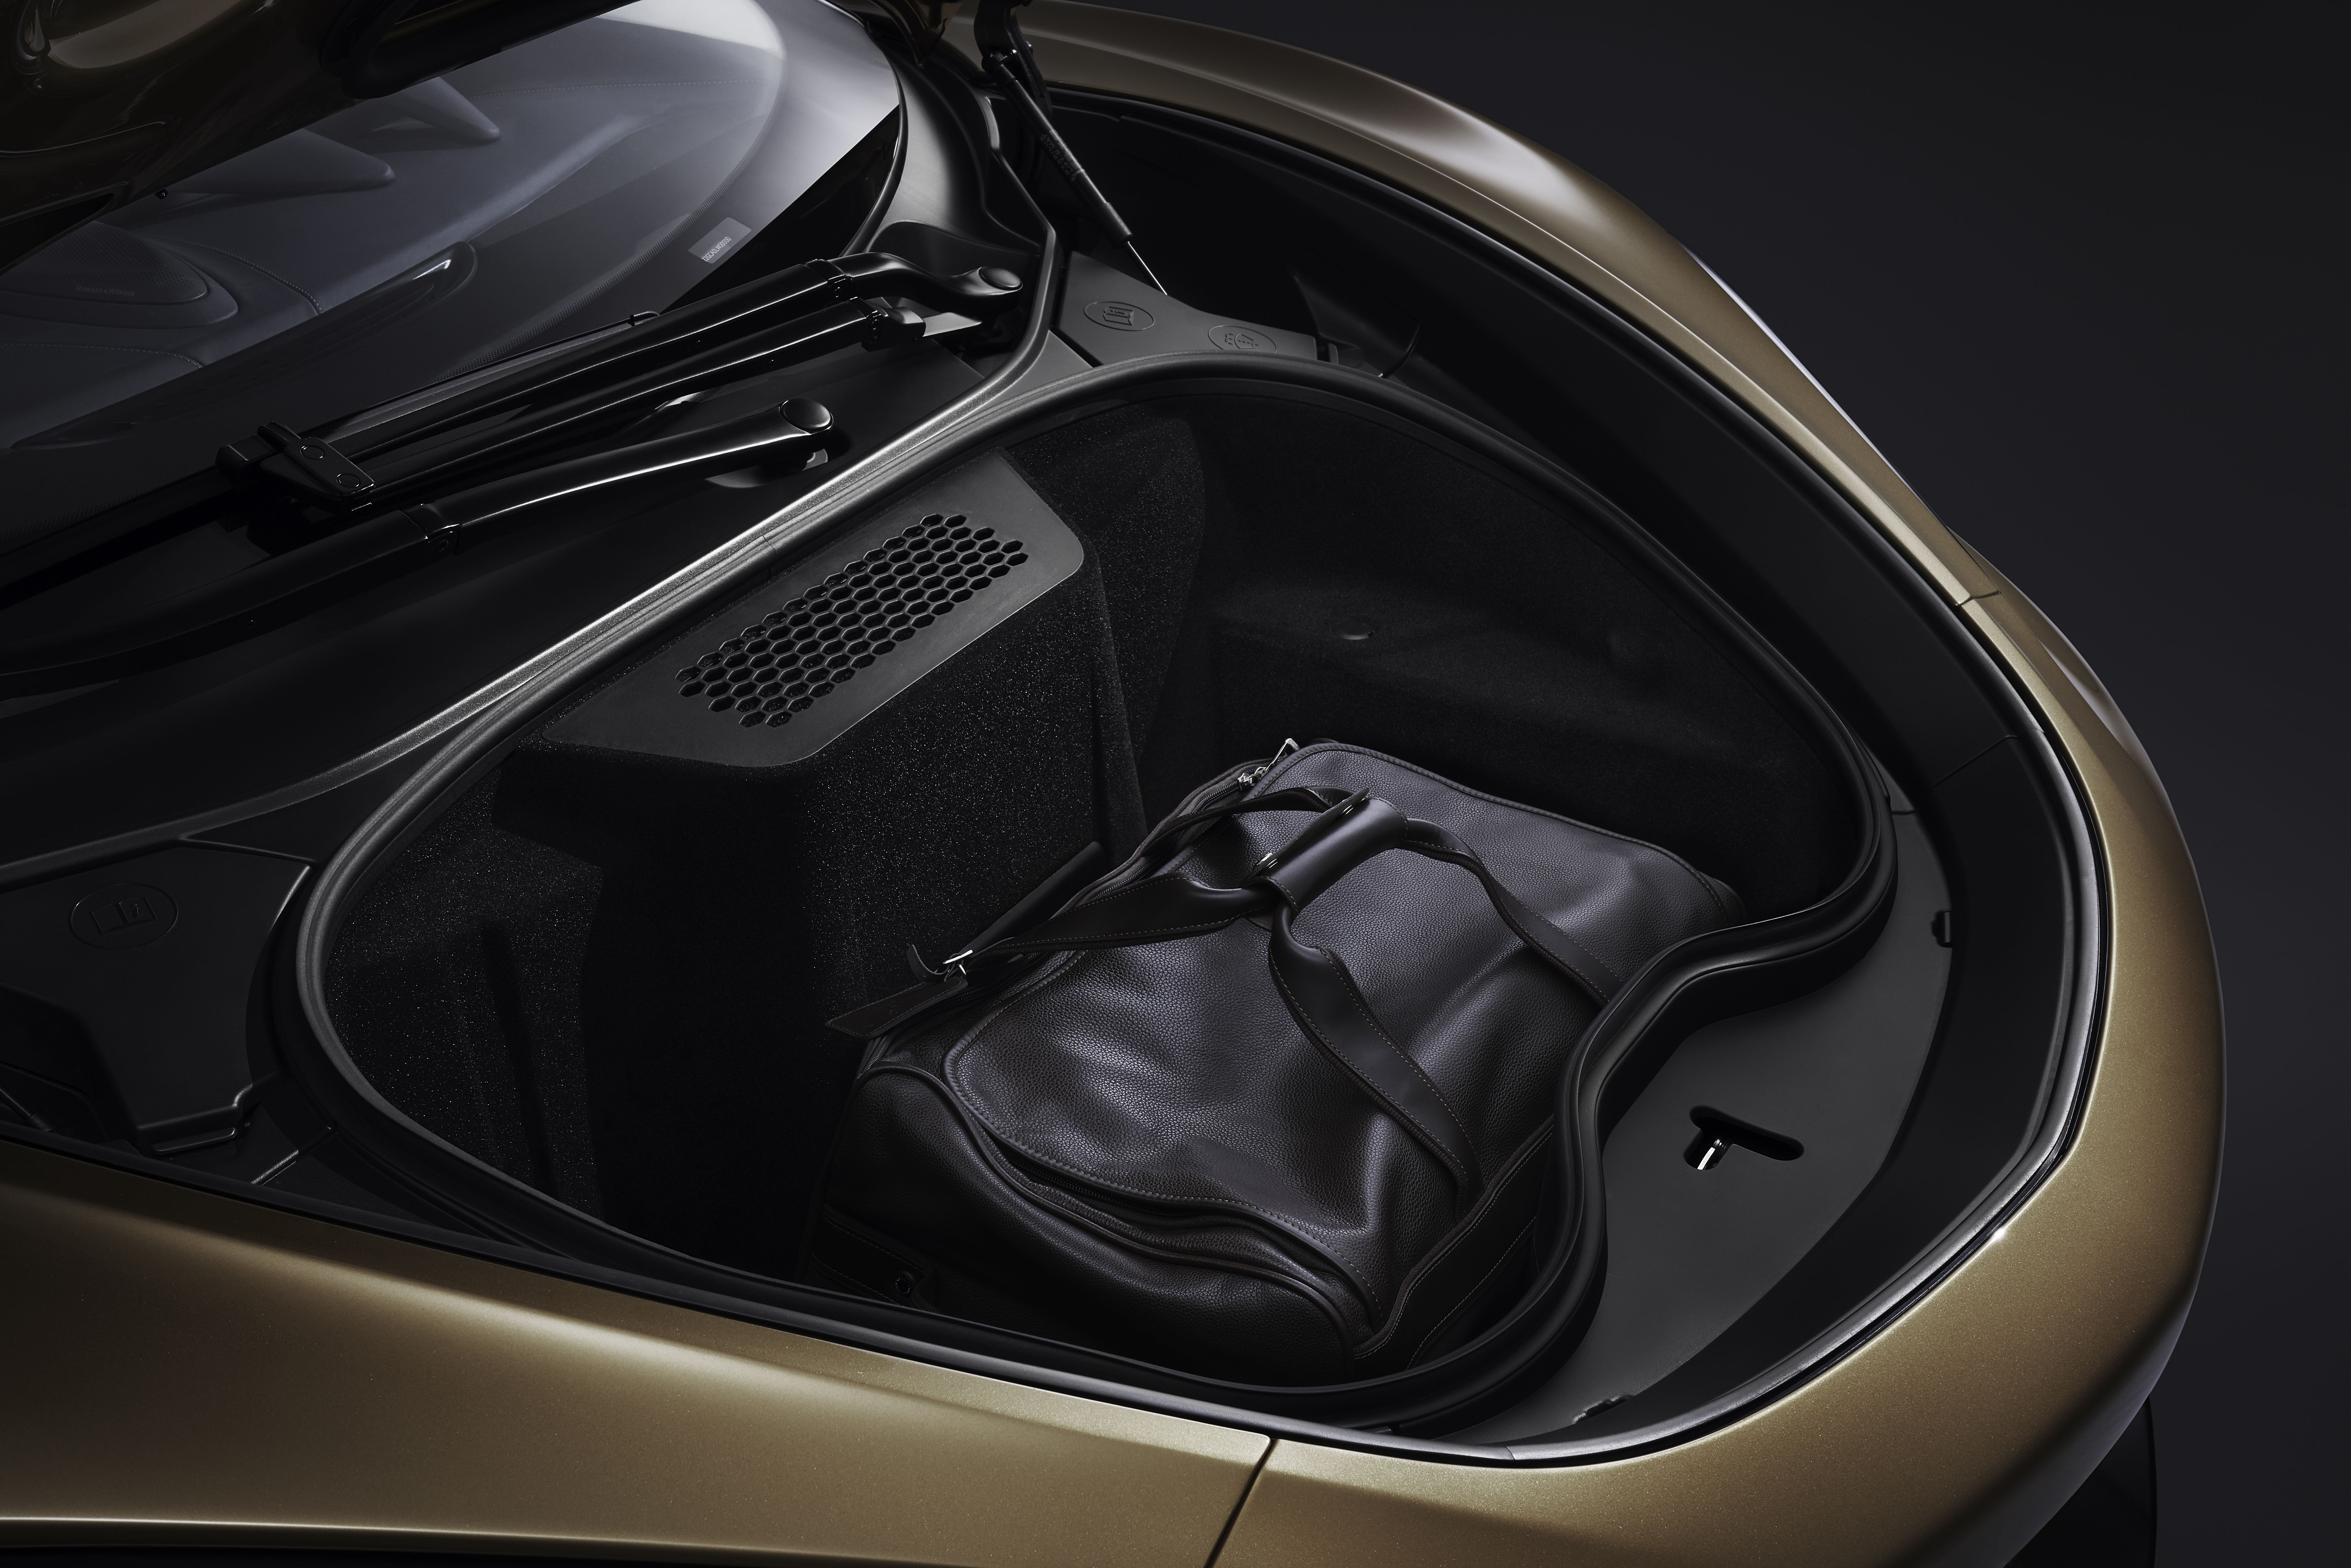 The Mclaren Gt Offers More Trunk Space Than Some Sedans New Mclaren Super Cars Mclaren